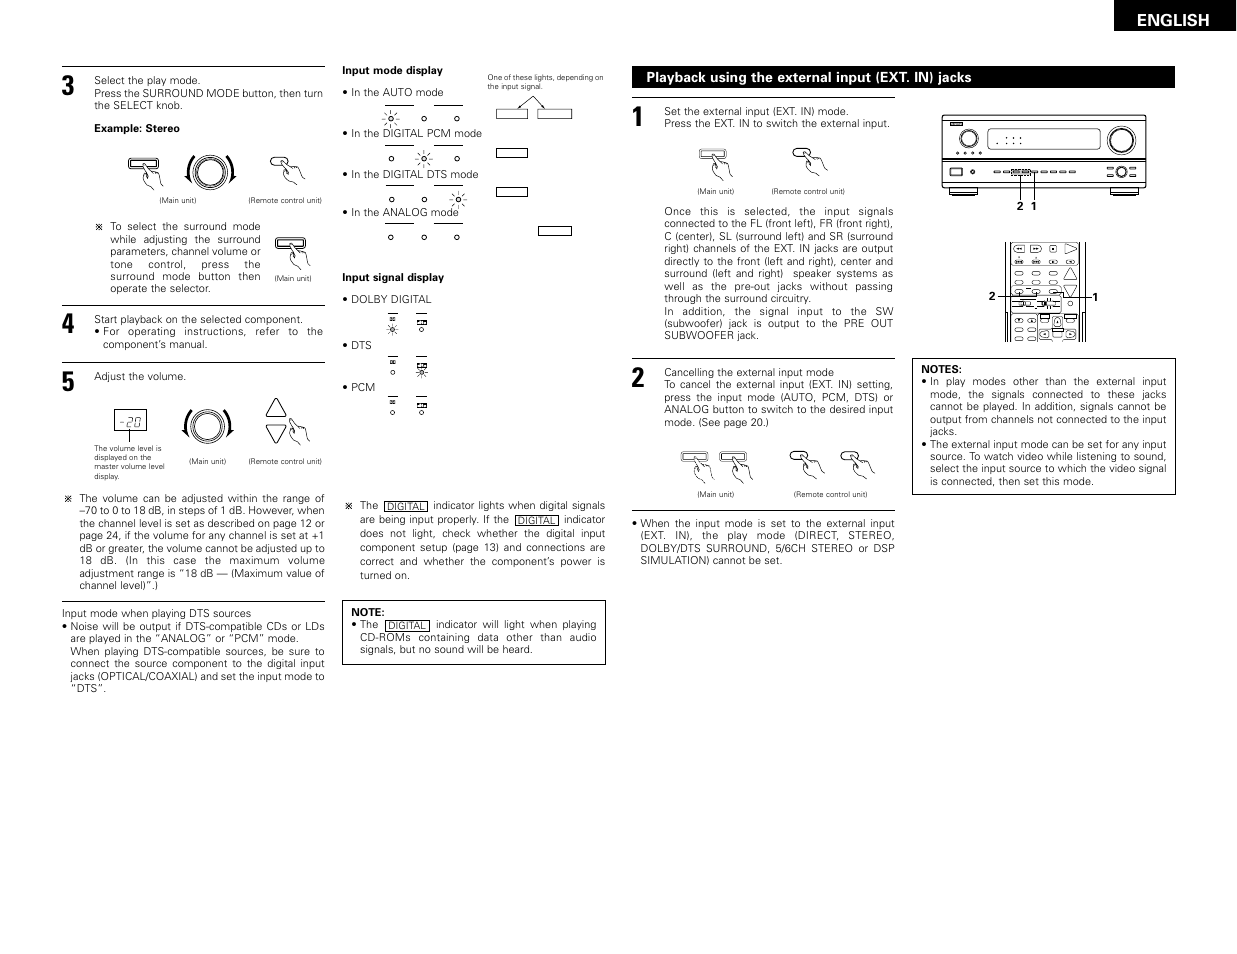 english denon avr 2802 user manual page 21 74 original mode rh manualsdir com denon avr 2802 user manual pdf denon receivers avr 2802 manual